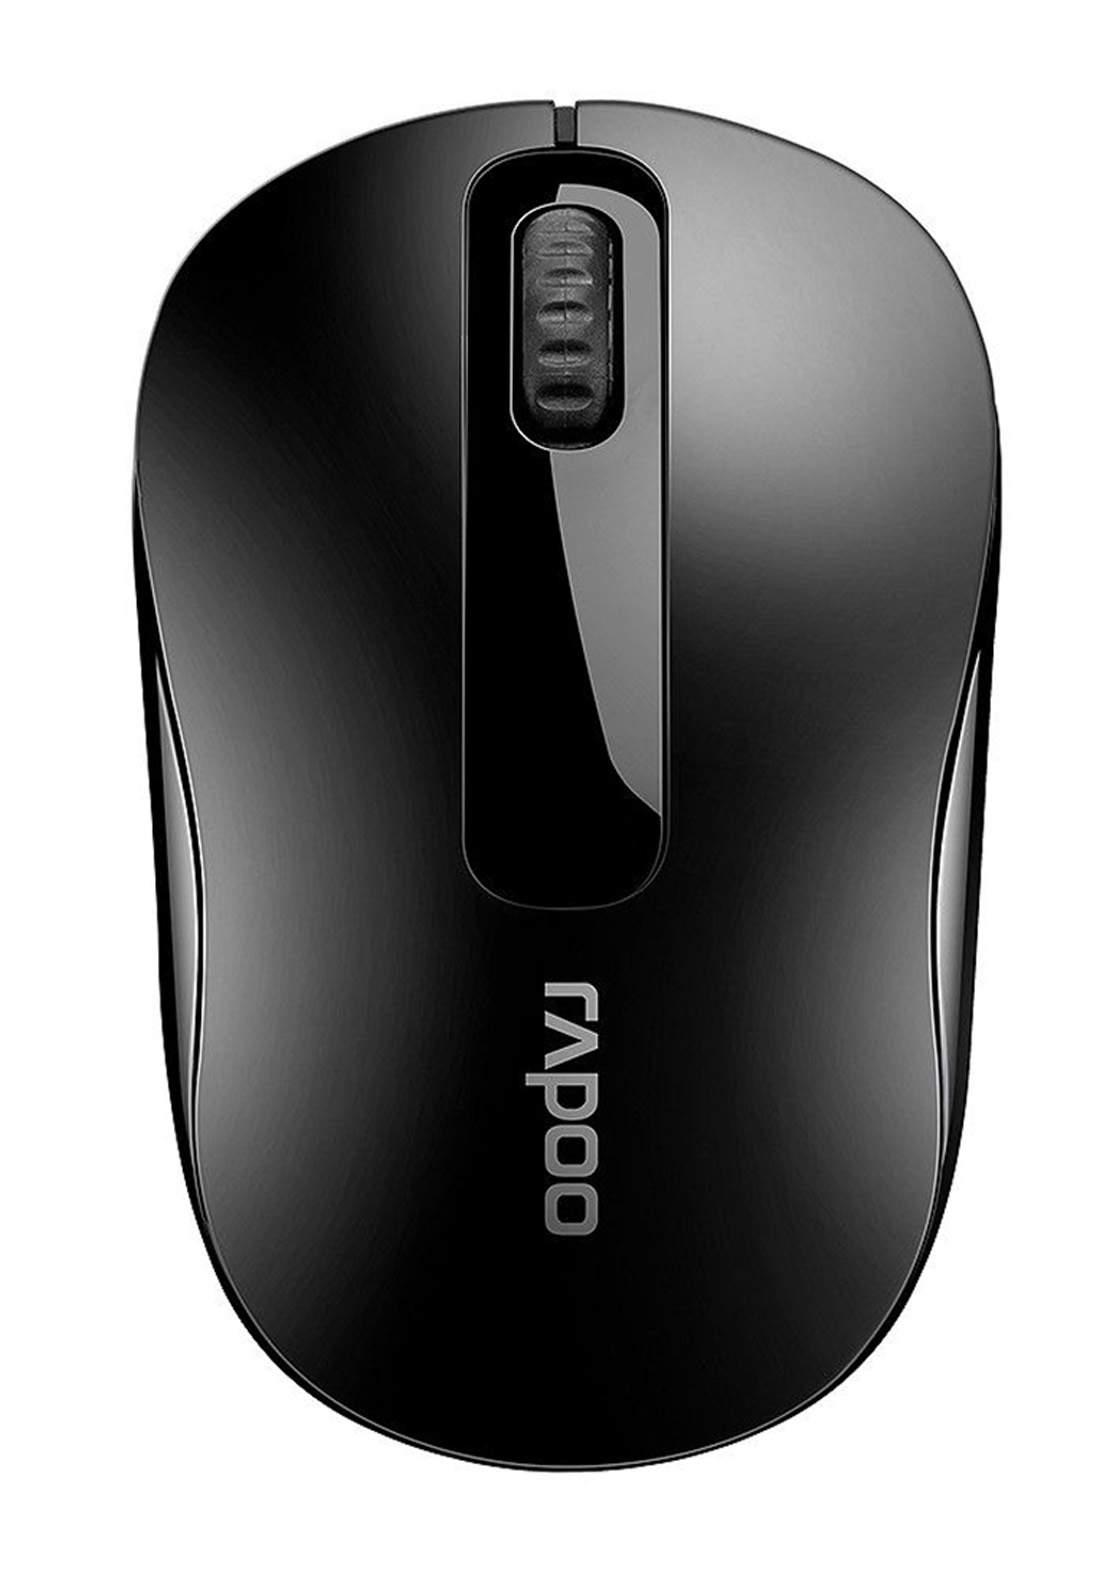 Rapoo M10 Plus Wireless Mouse - Black ماوس